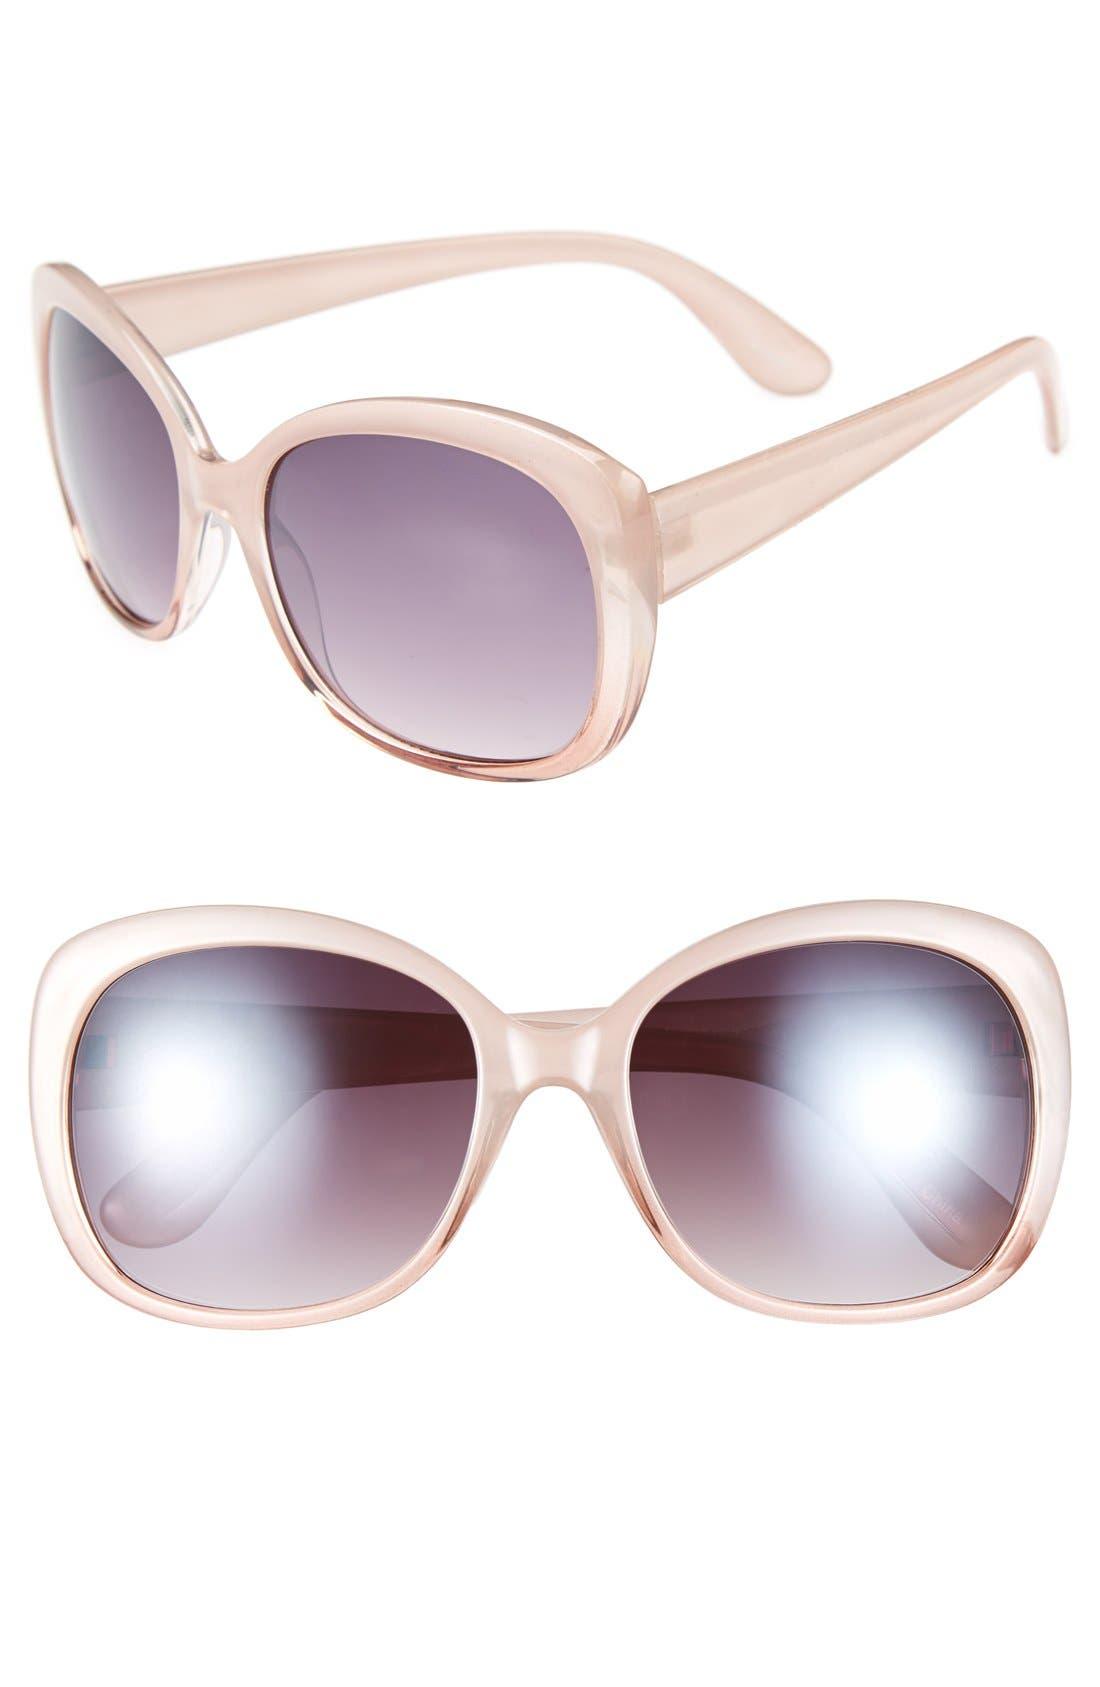 Alternate Image 1 Selected - Icon Eyewear 'Tokyo' 56mm Oversized Sunglasses (2 for $20)